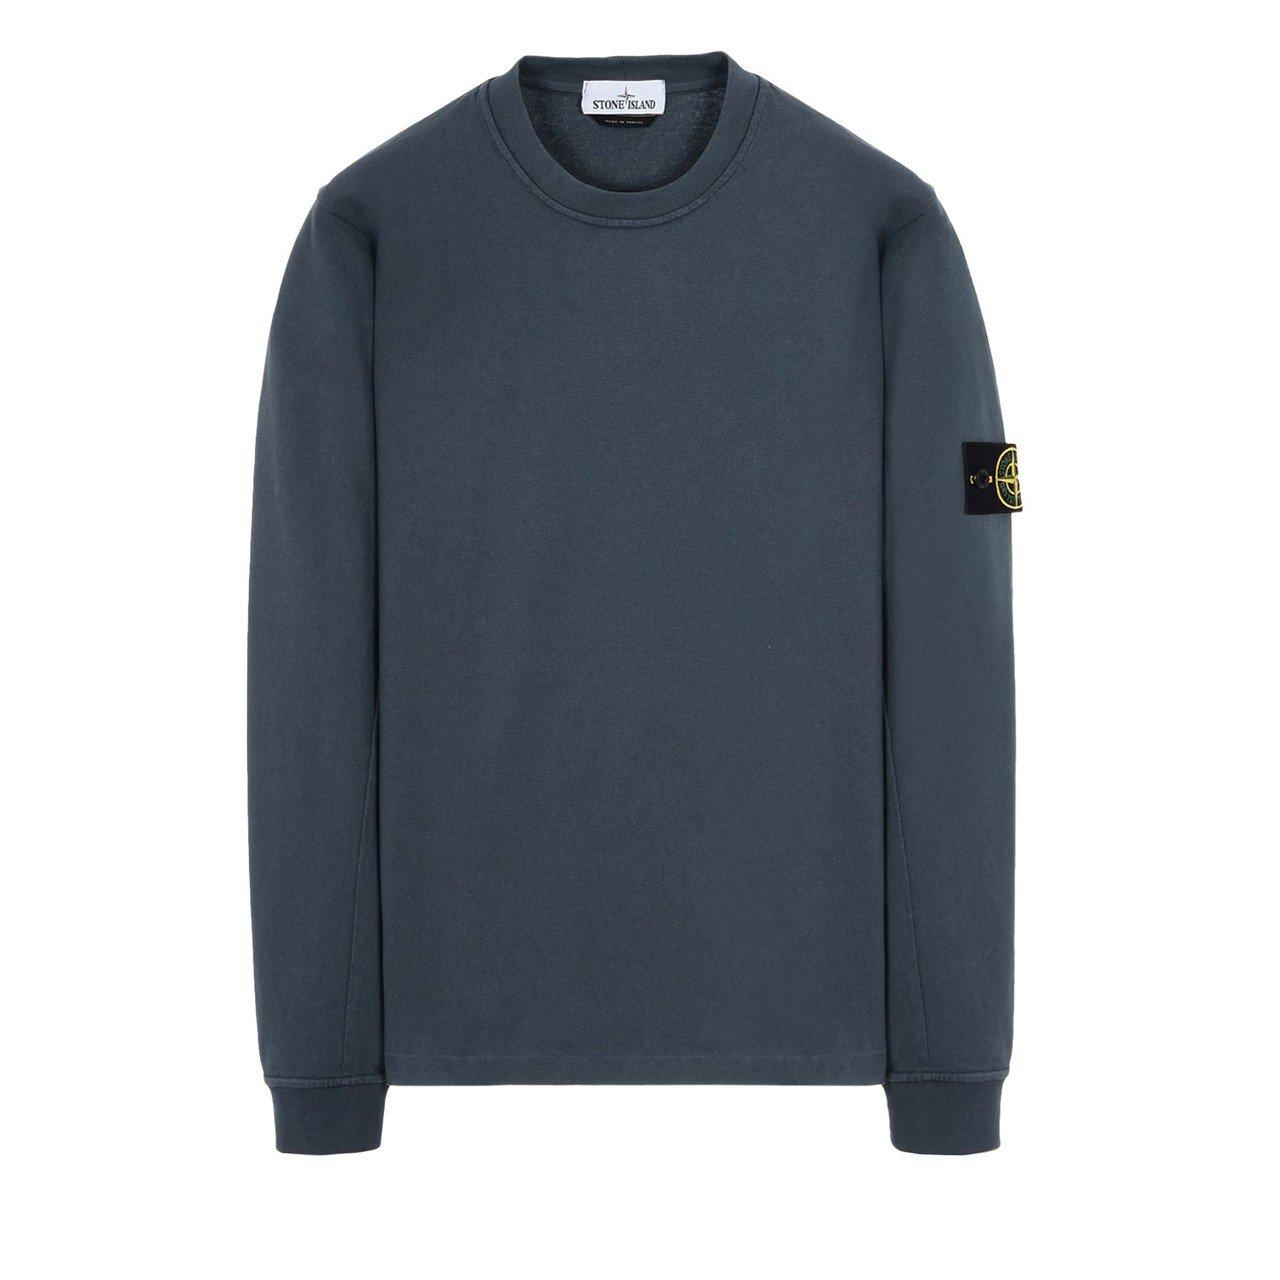 stone-island-sweat-shirt-charcoal-grey-681565360-v0165-1